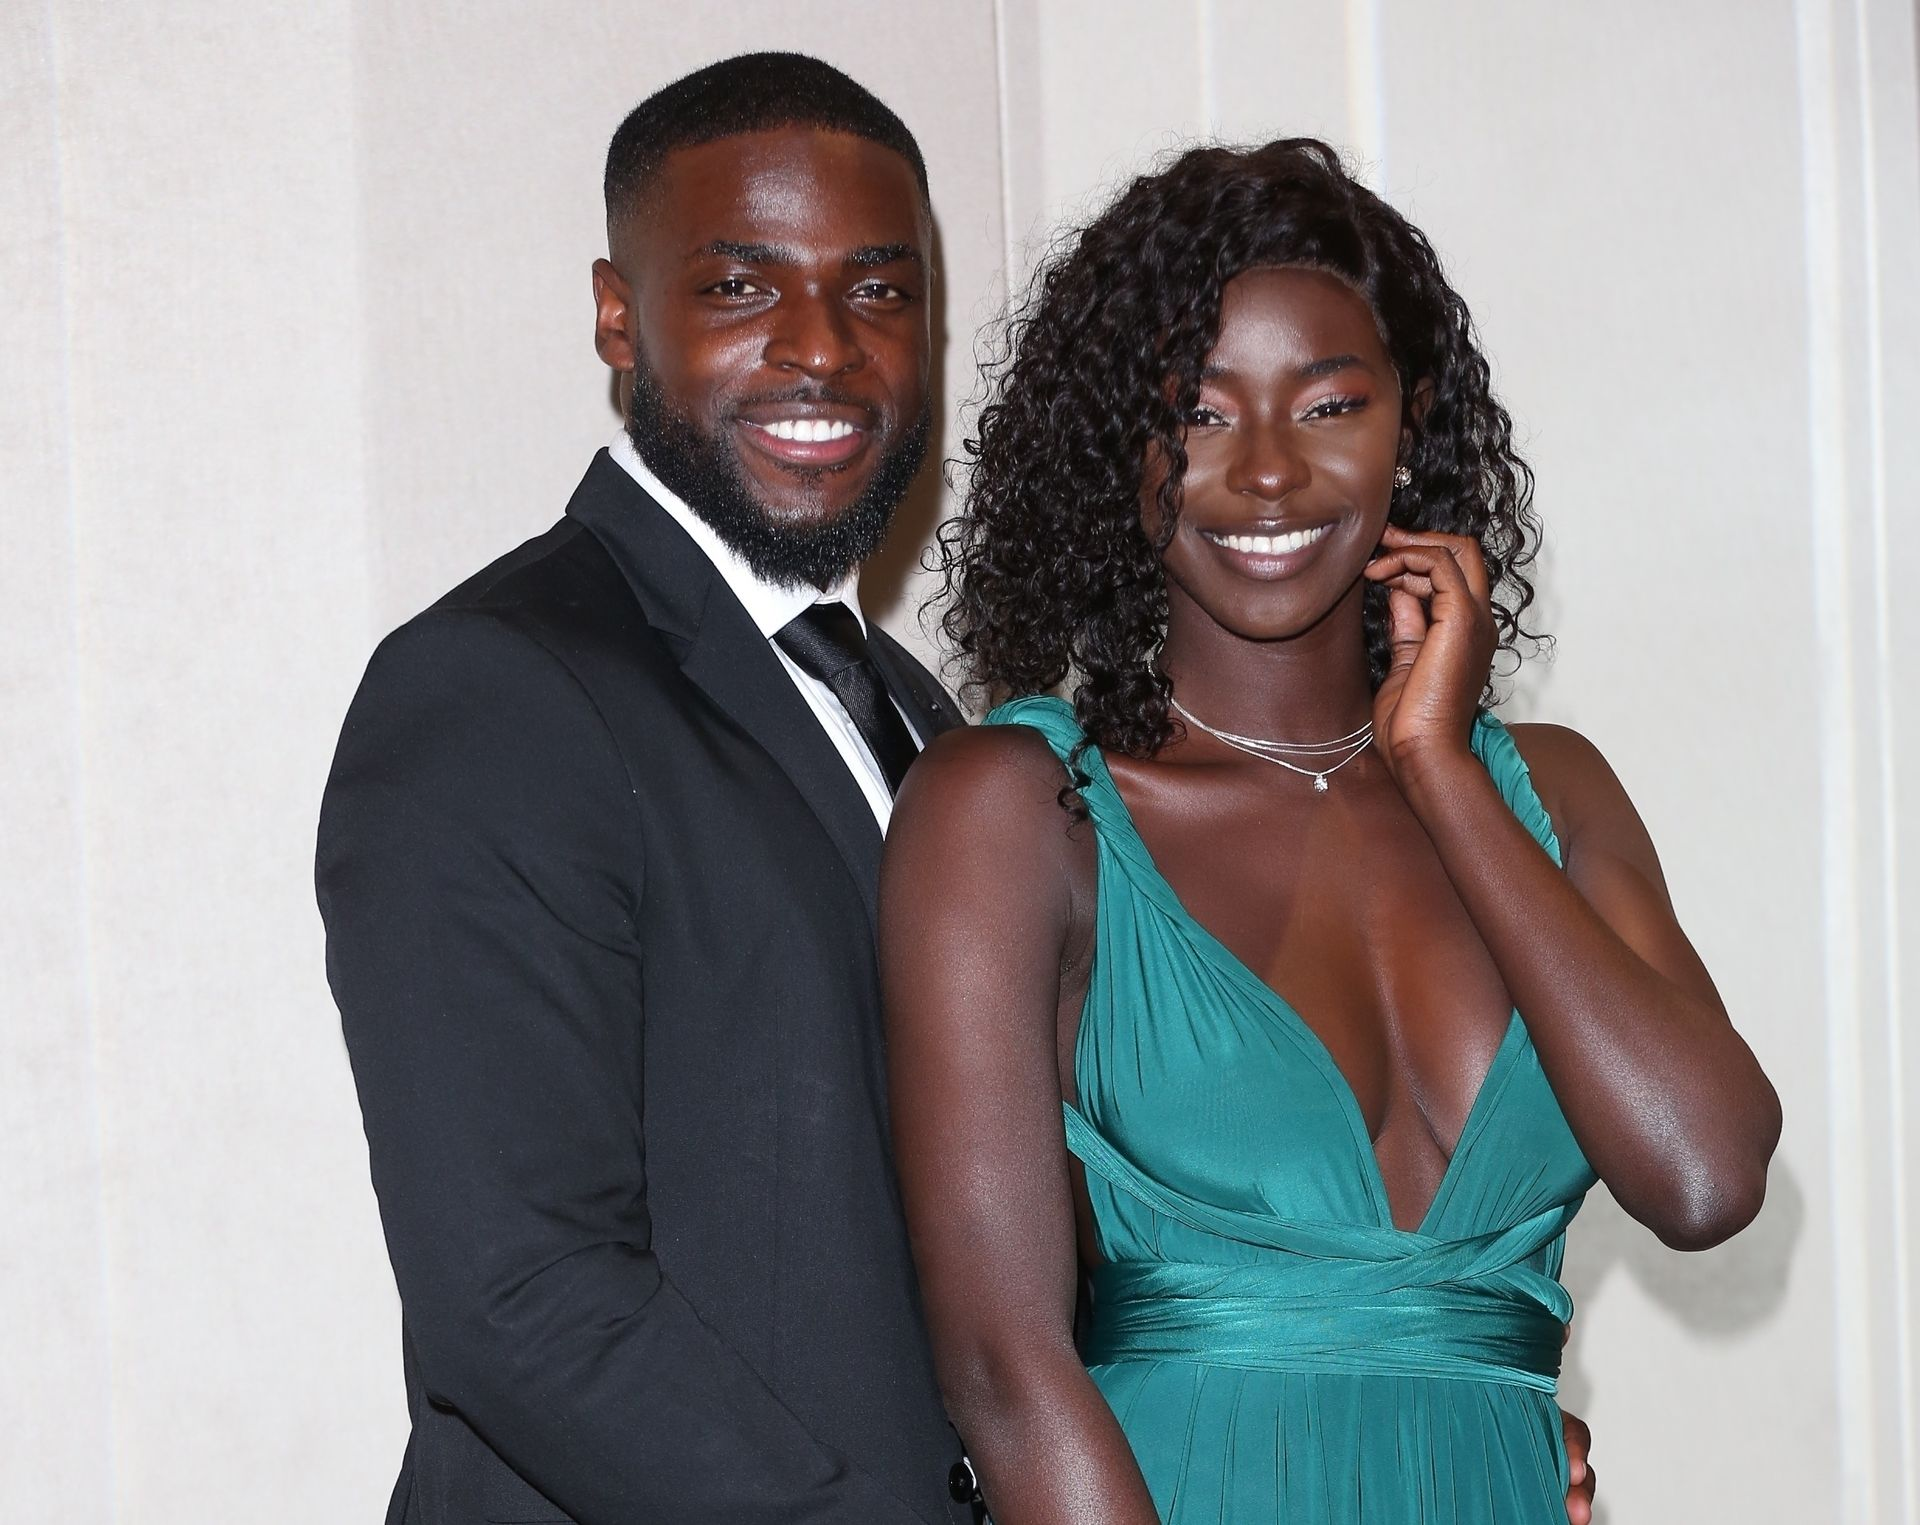 Mike Boateng & Priscilla Anyabu Are Seen At British Ethnic Diversity Sports Awards 0133